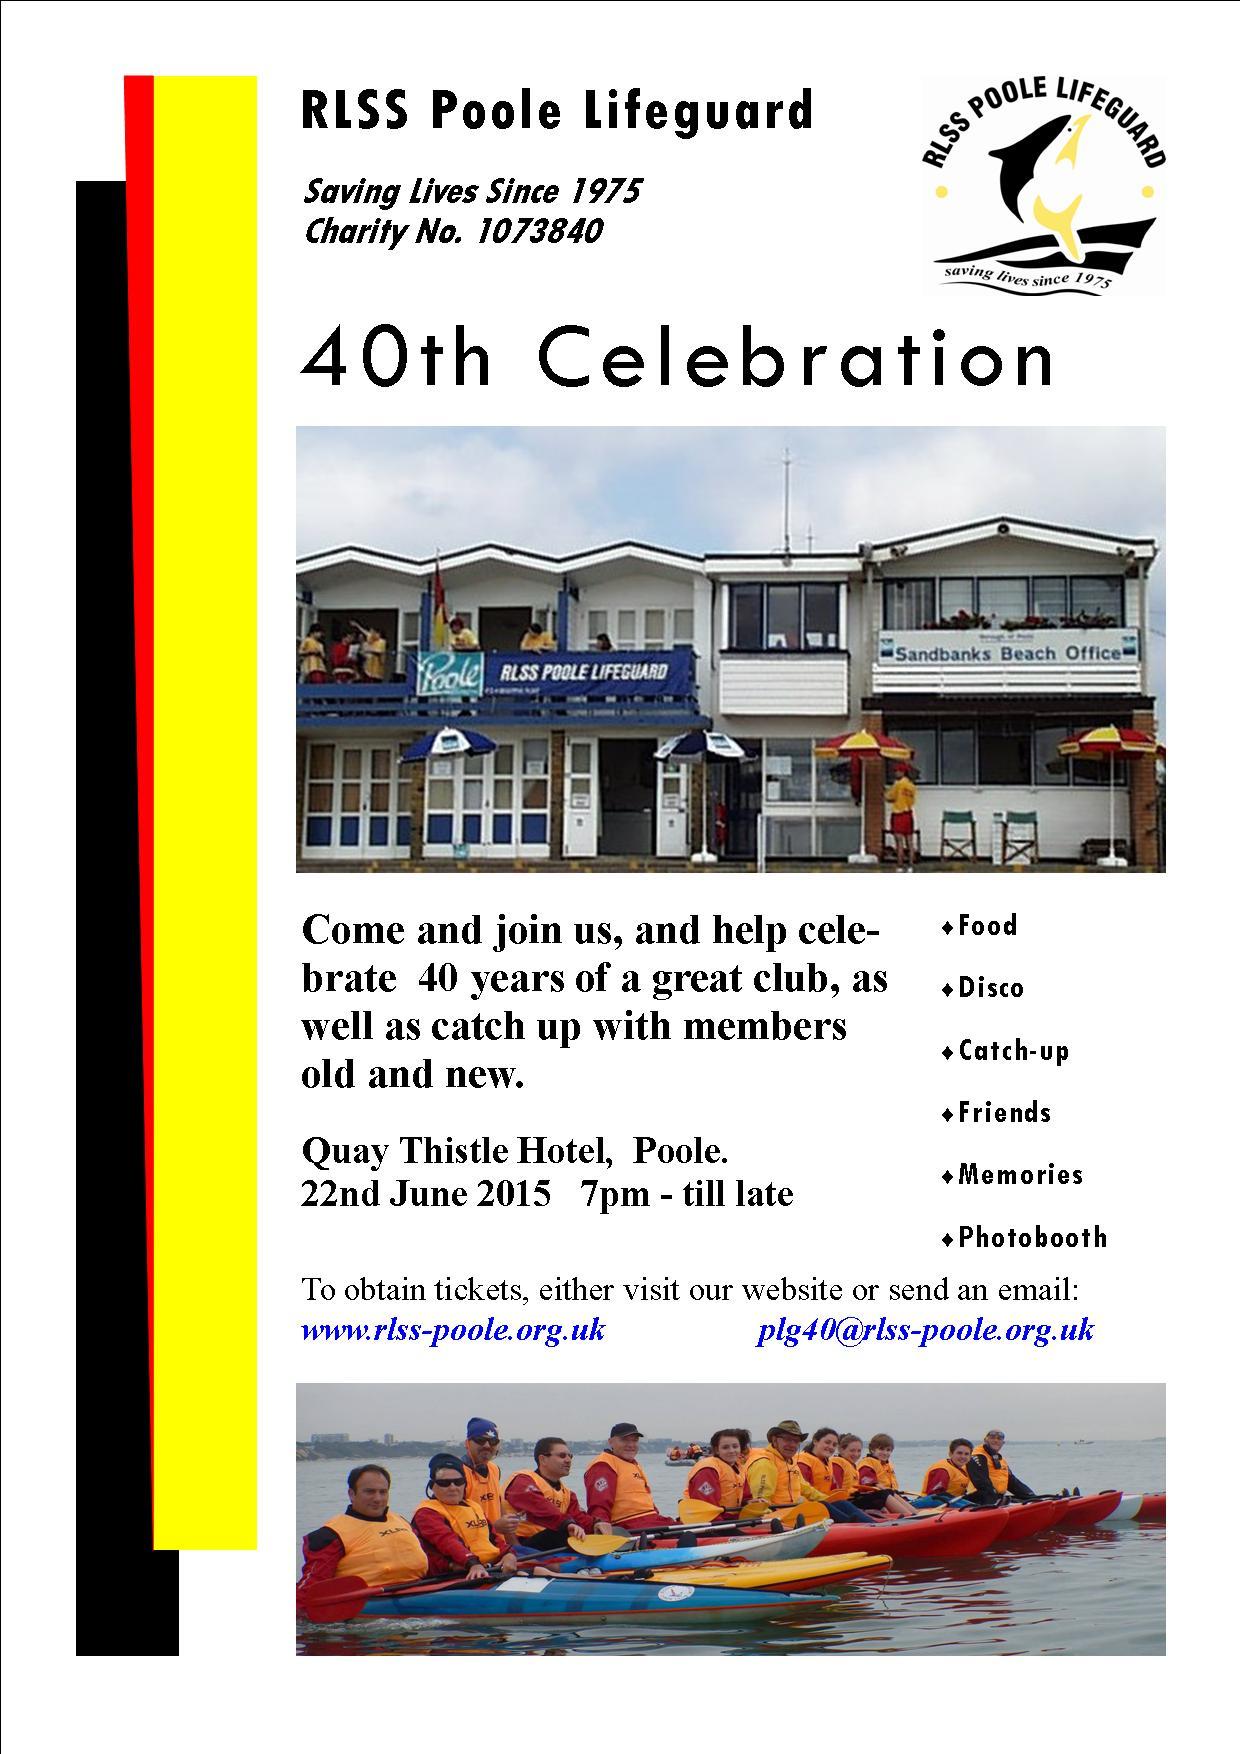 RLSS Poole Lifeguard 40th Celebration